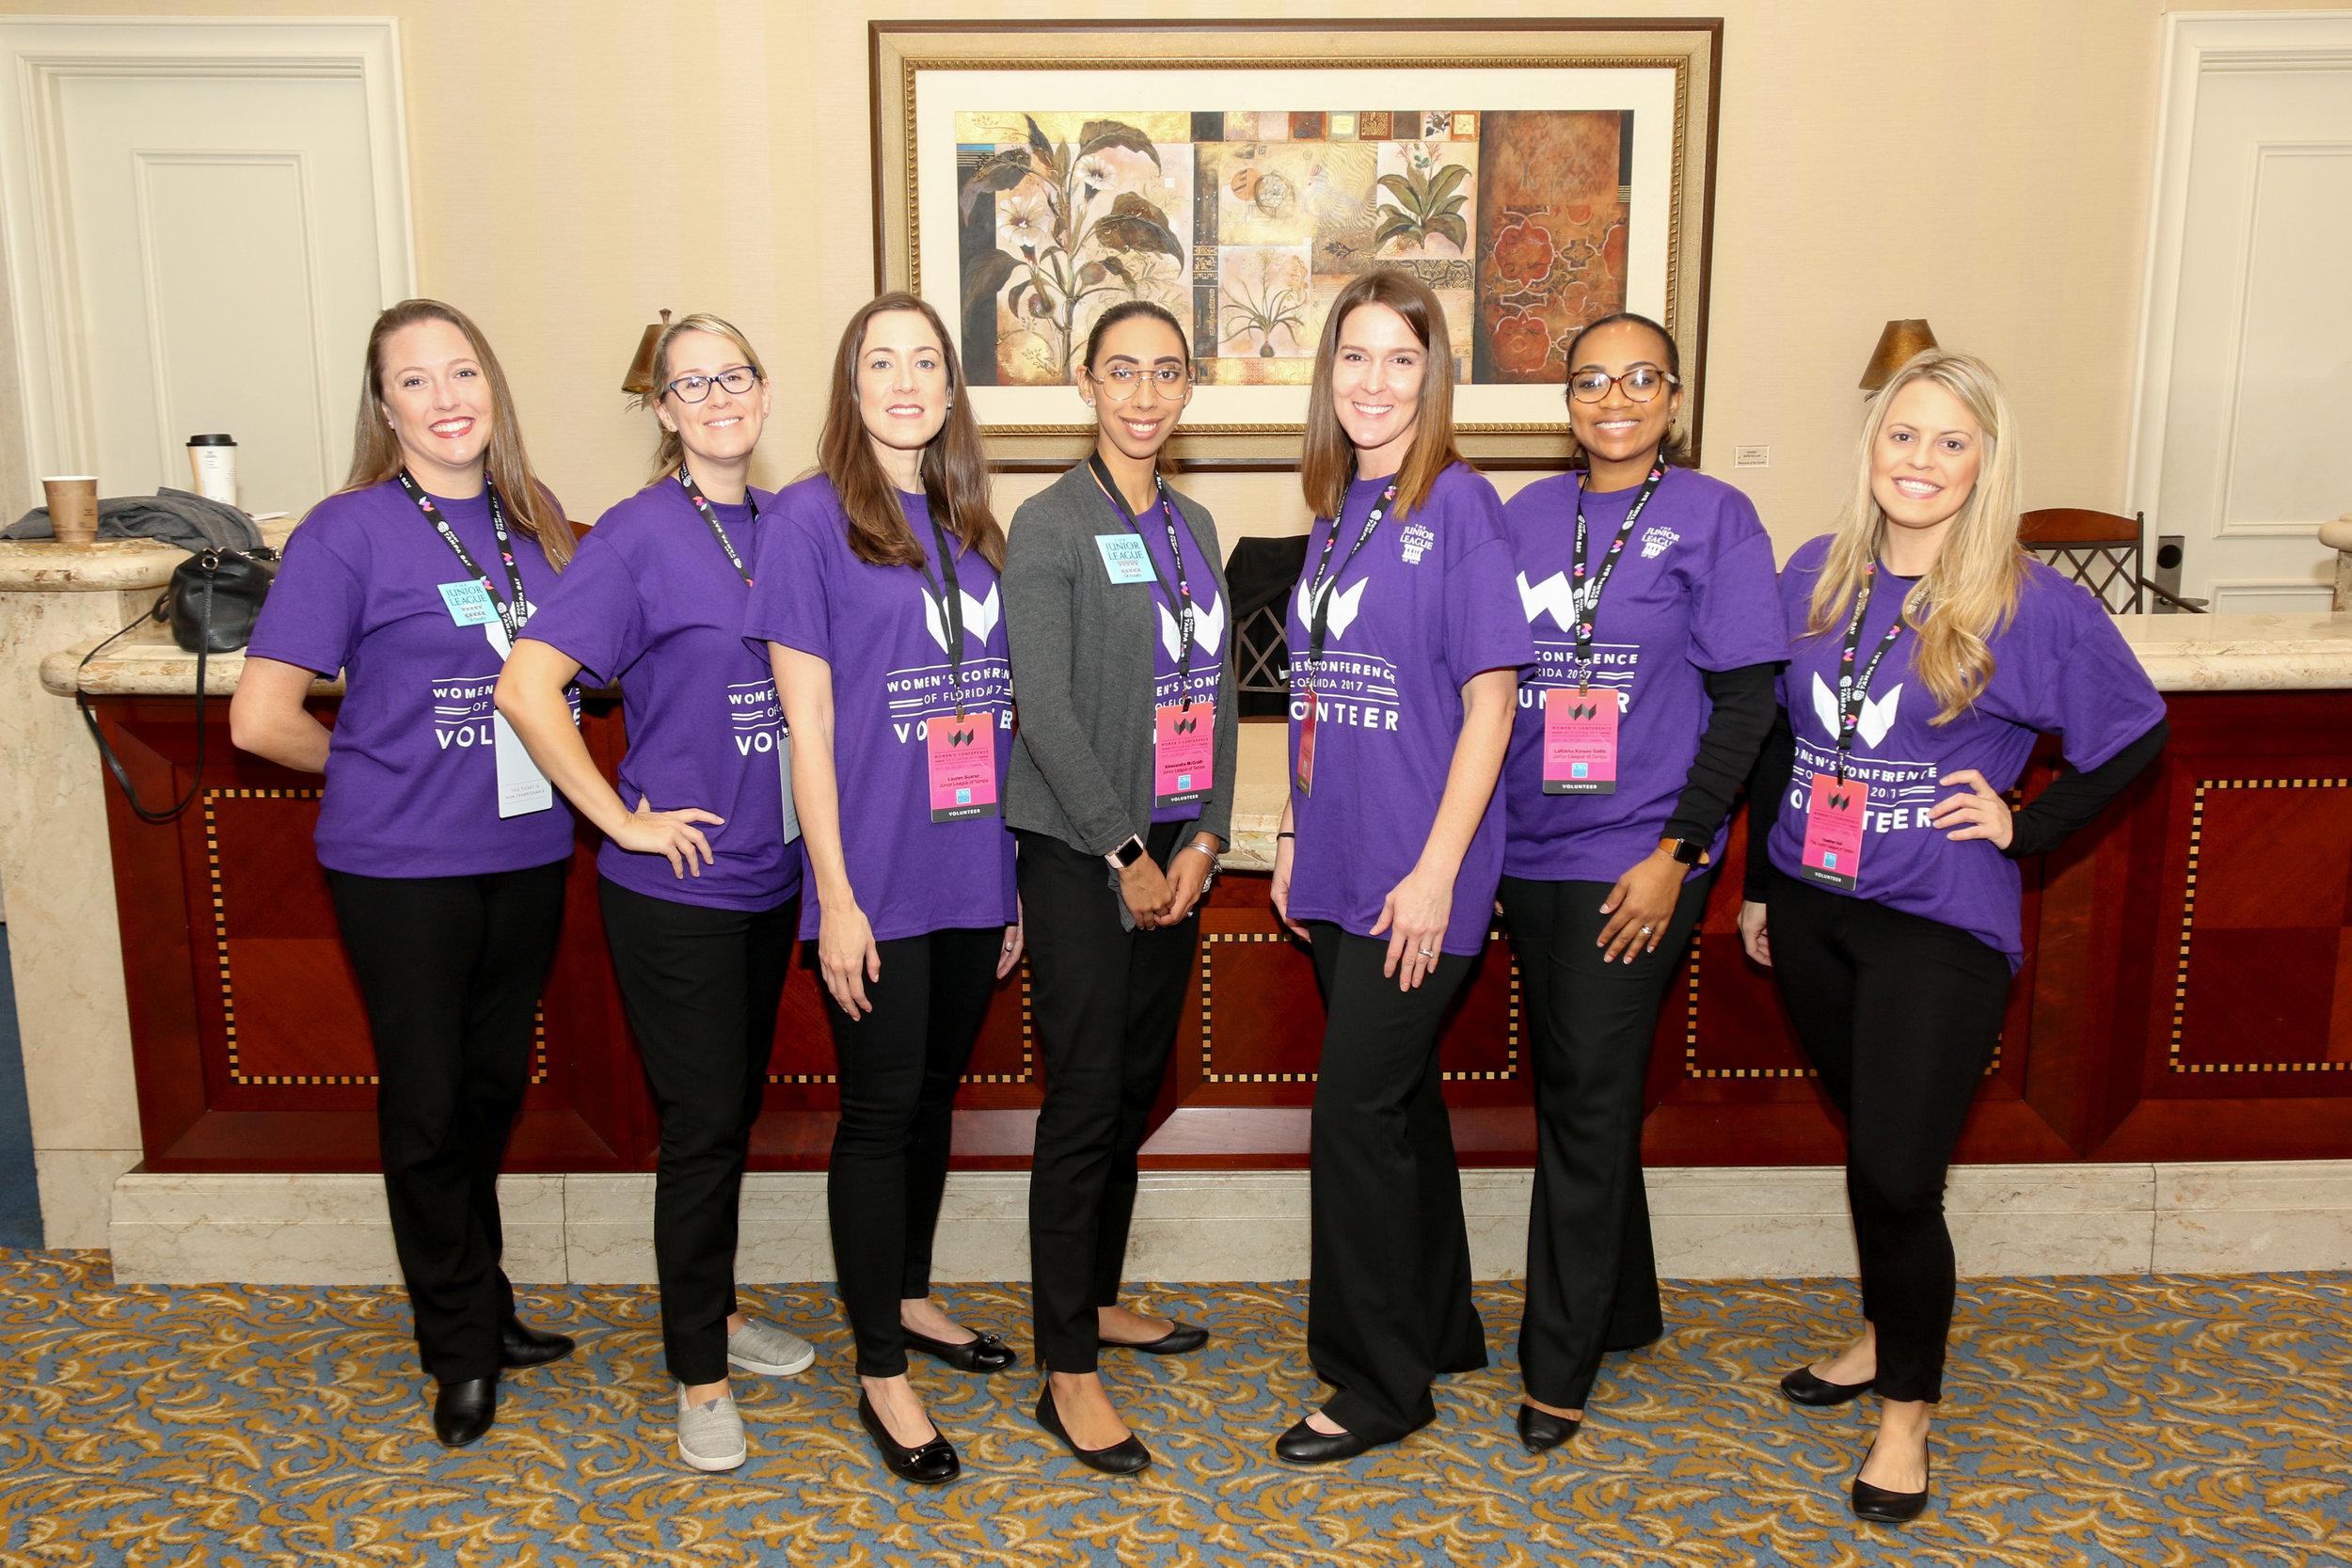 447_WomensConference_10-27-17.jpg